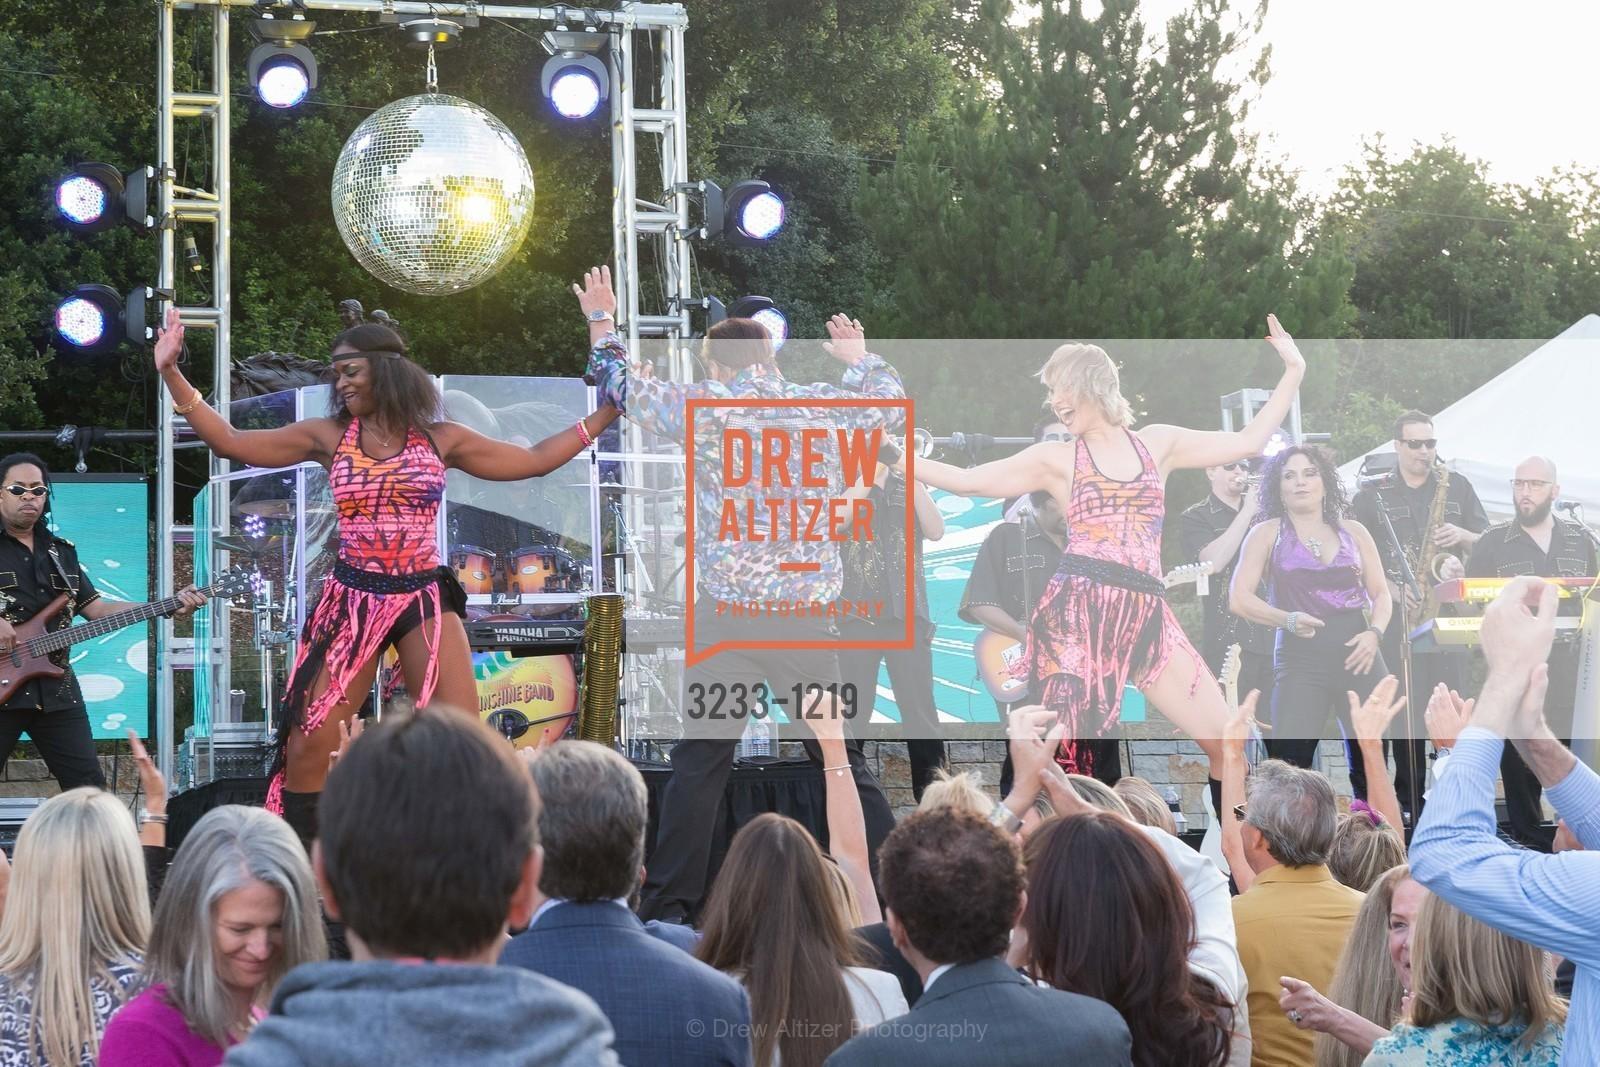 KC And The Sunshine Band, Photo #3233-1219